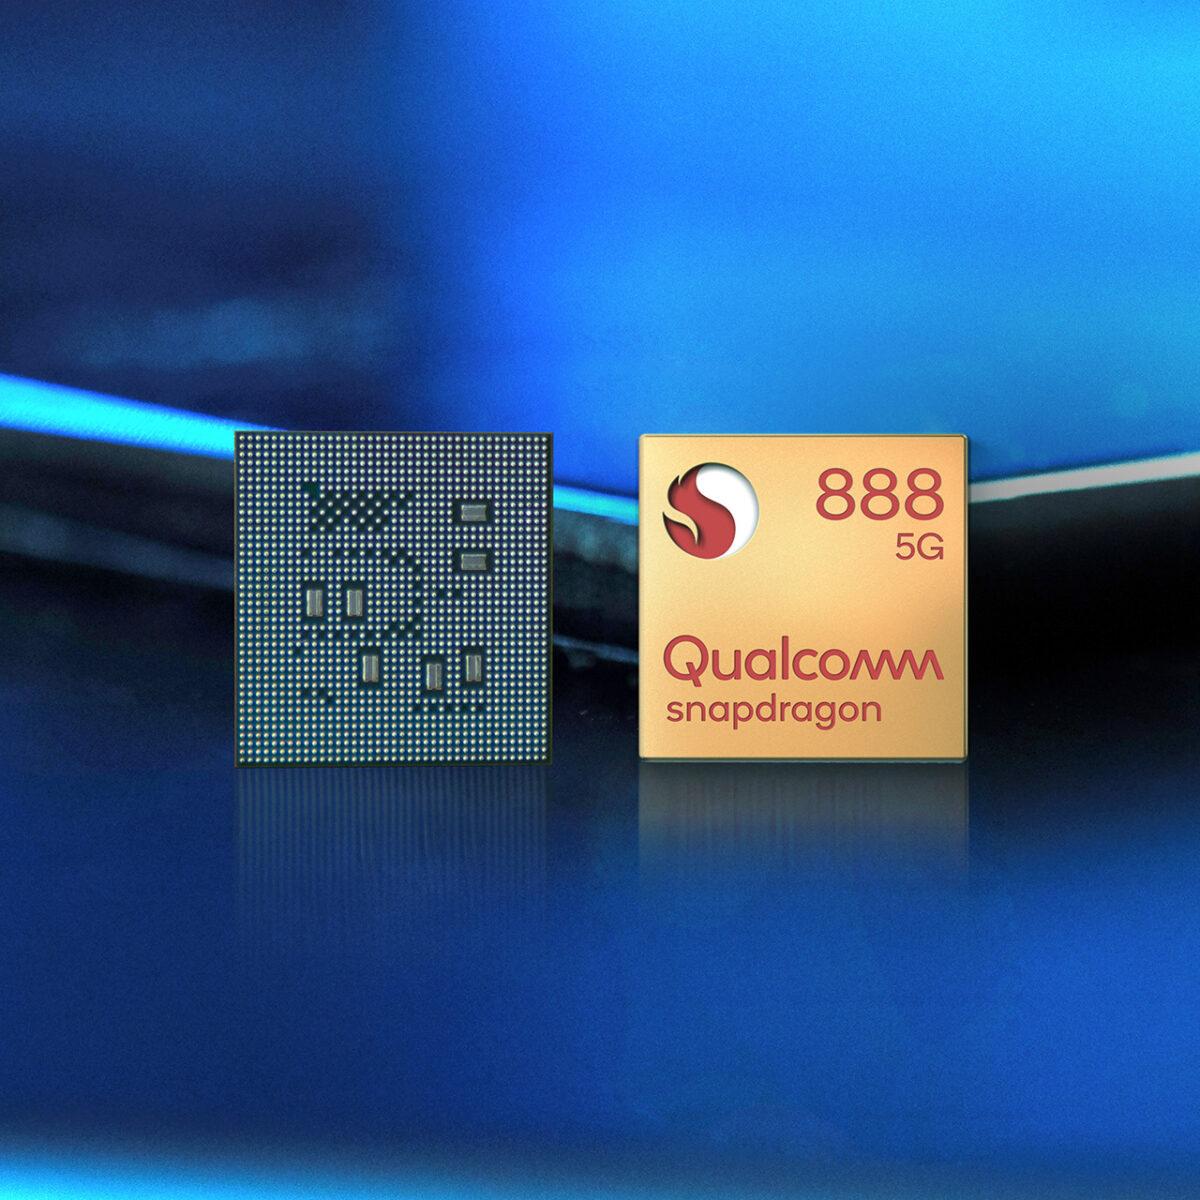 Qualcomm Snapdragon 888 SoC